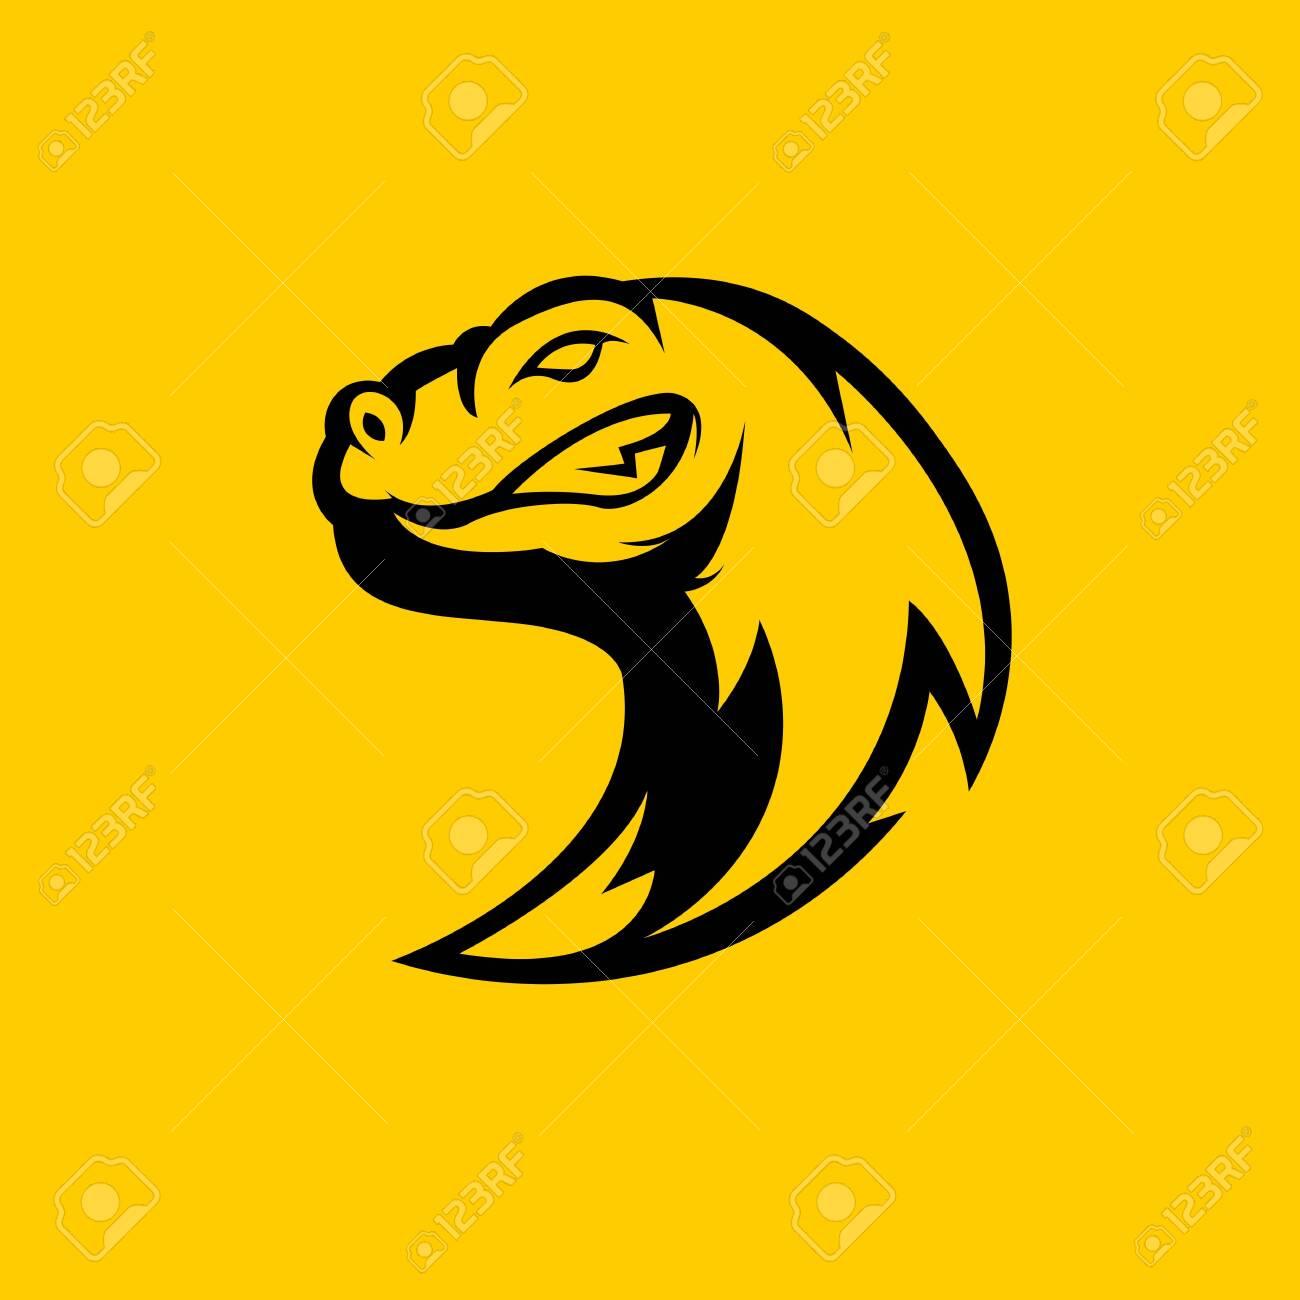 comienzo Problema Goteo  Komodo Dragon Mascot Logo Silhouette Version. Comodo Logo In.. Royalty Free  Cliparts, Vectors, And Stock Illustration. Image 147435204.